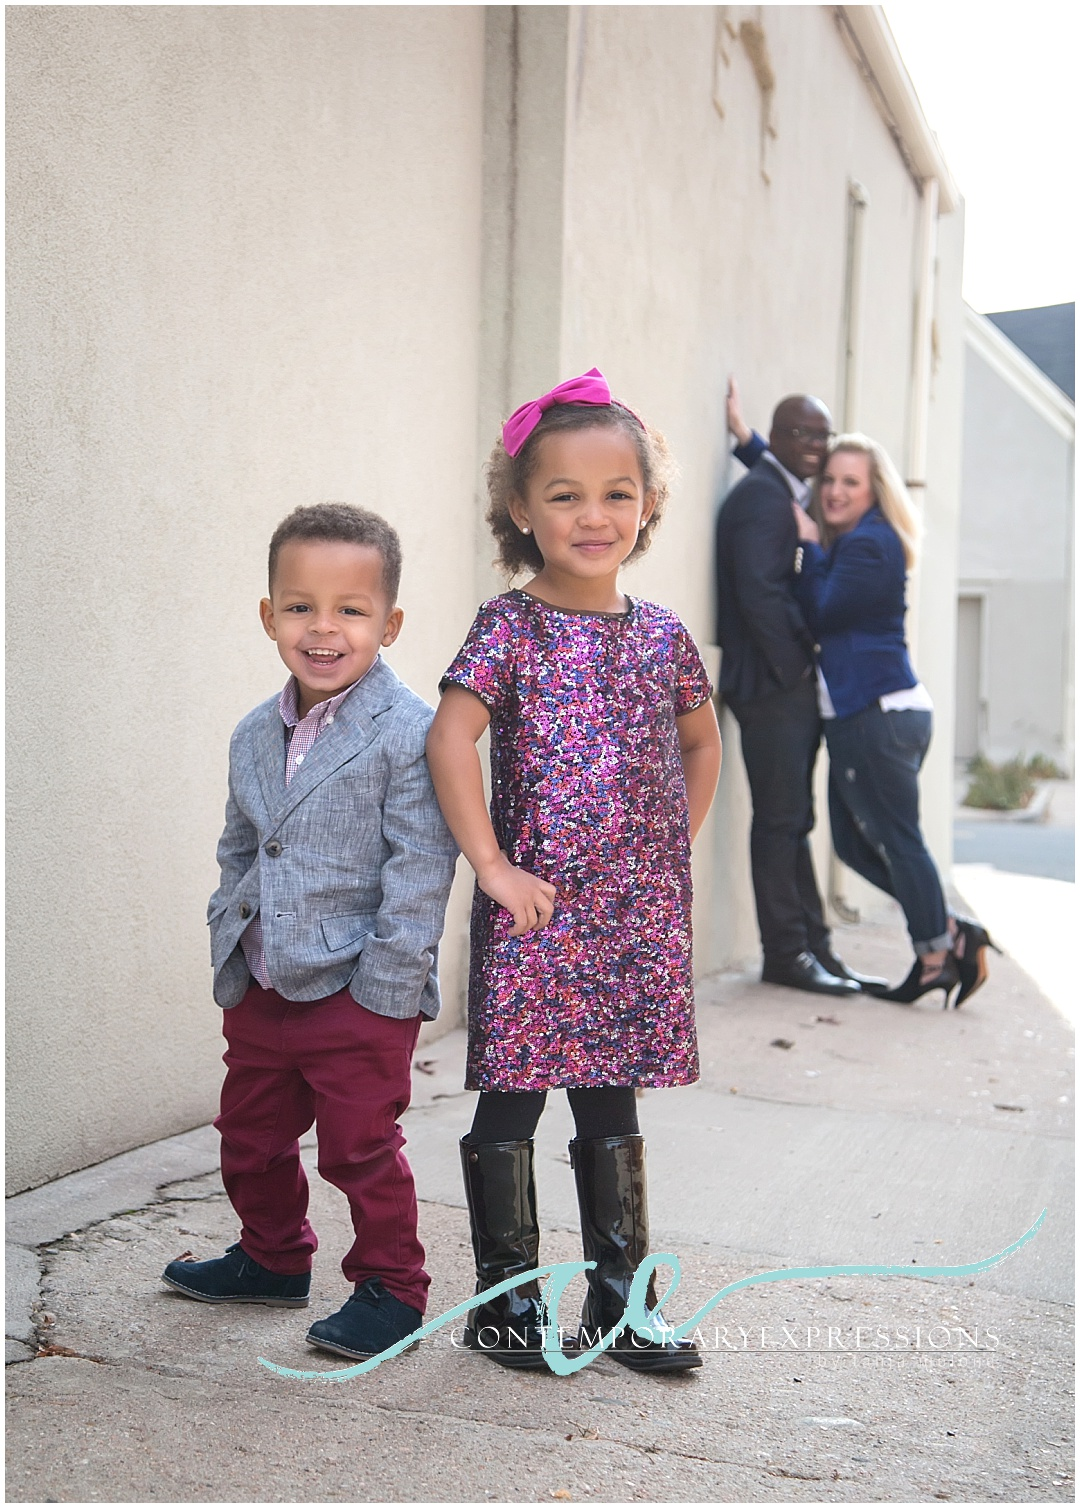 denverphotography-denverphotographer-denverfamilyphotography-familyphotography-family-photos